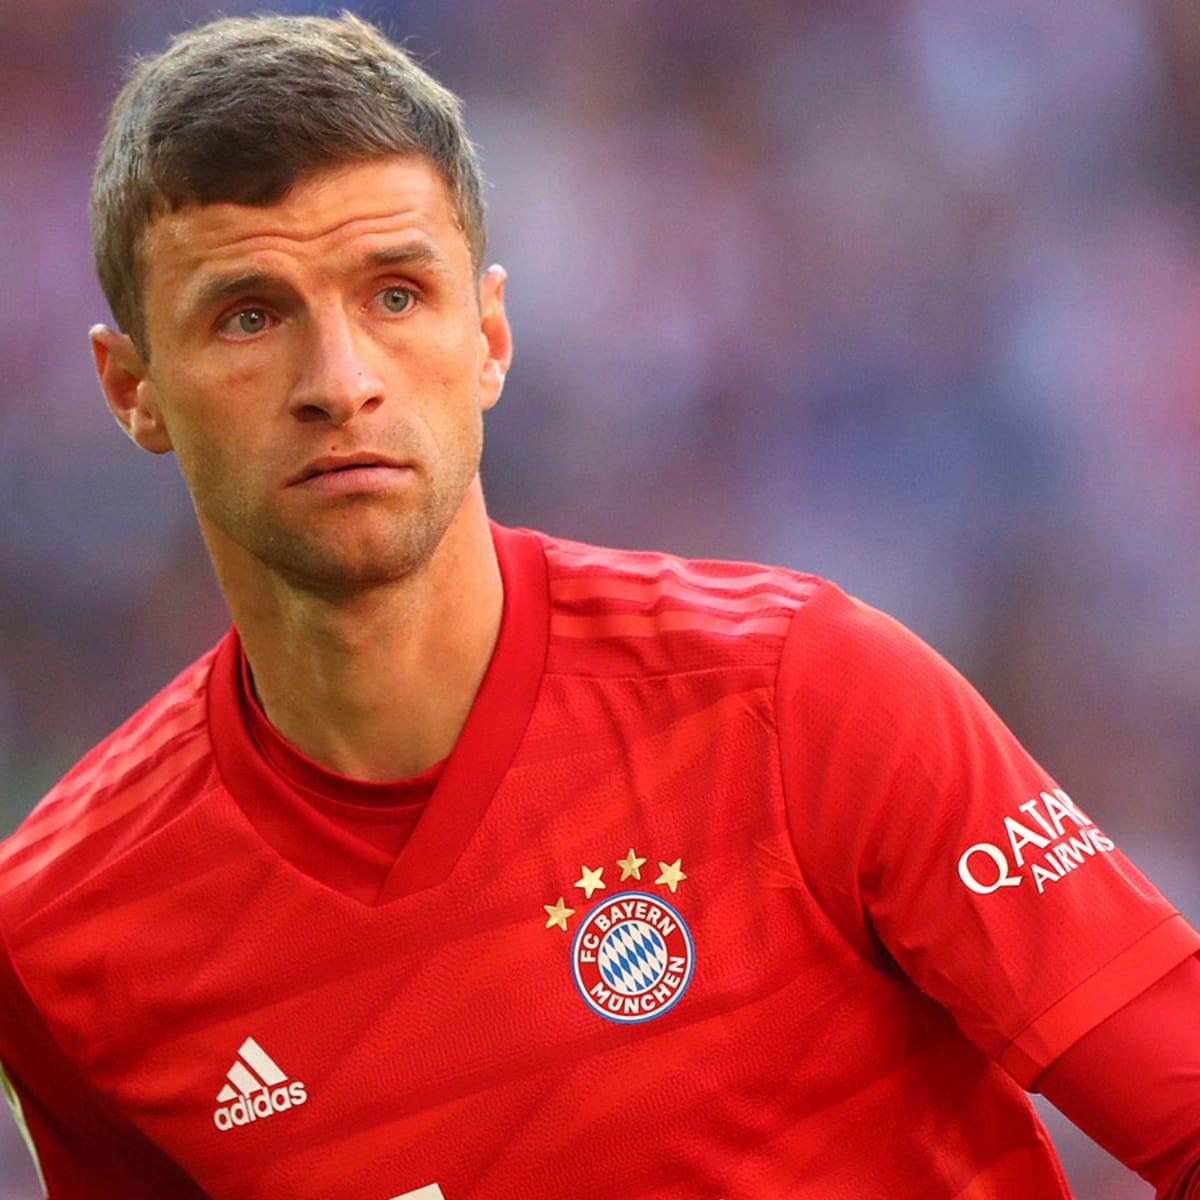 Thomas Muller: Bayern Munich signs star through 2023 - Sports Illustrated